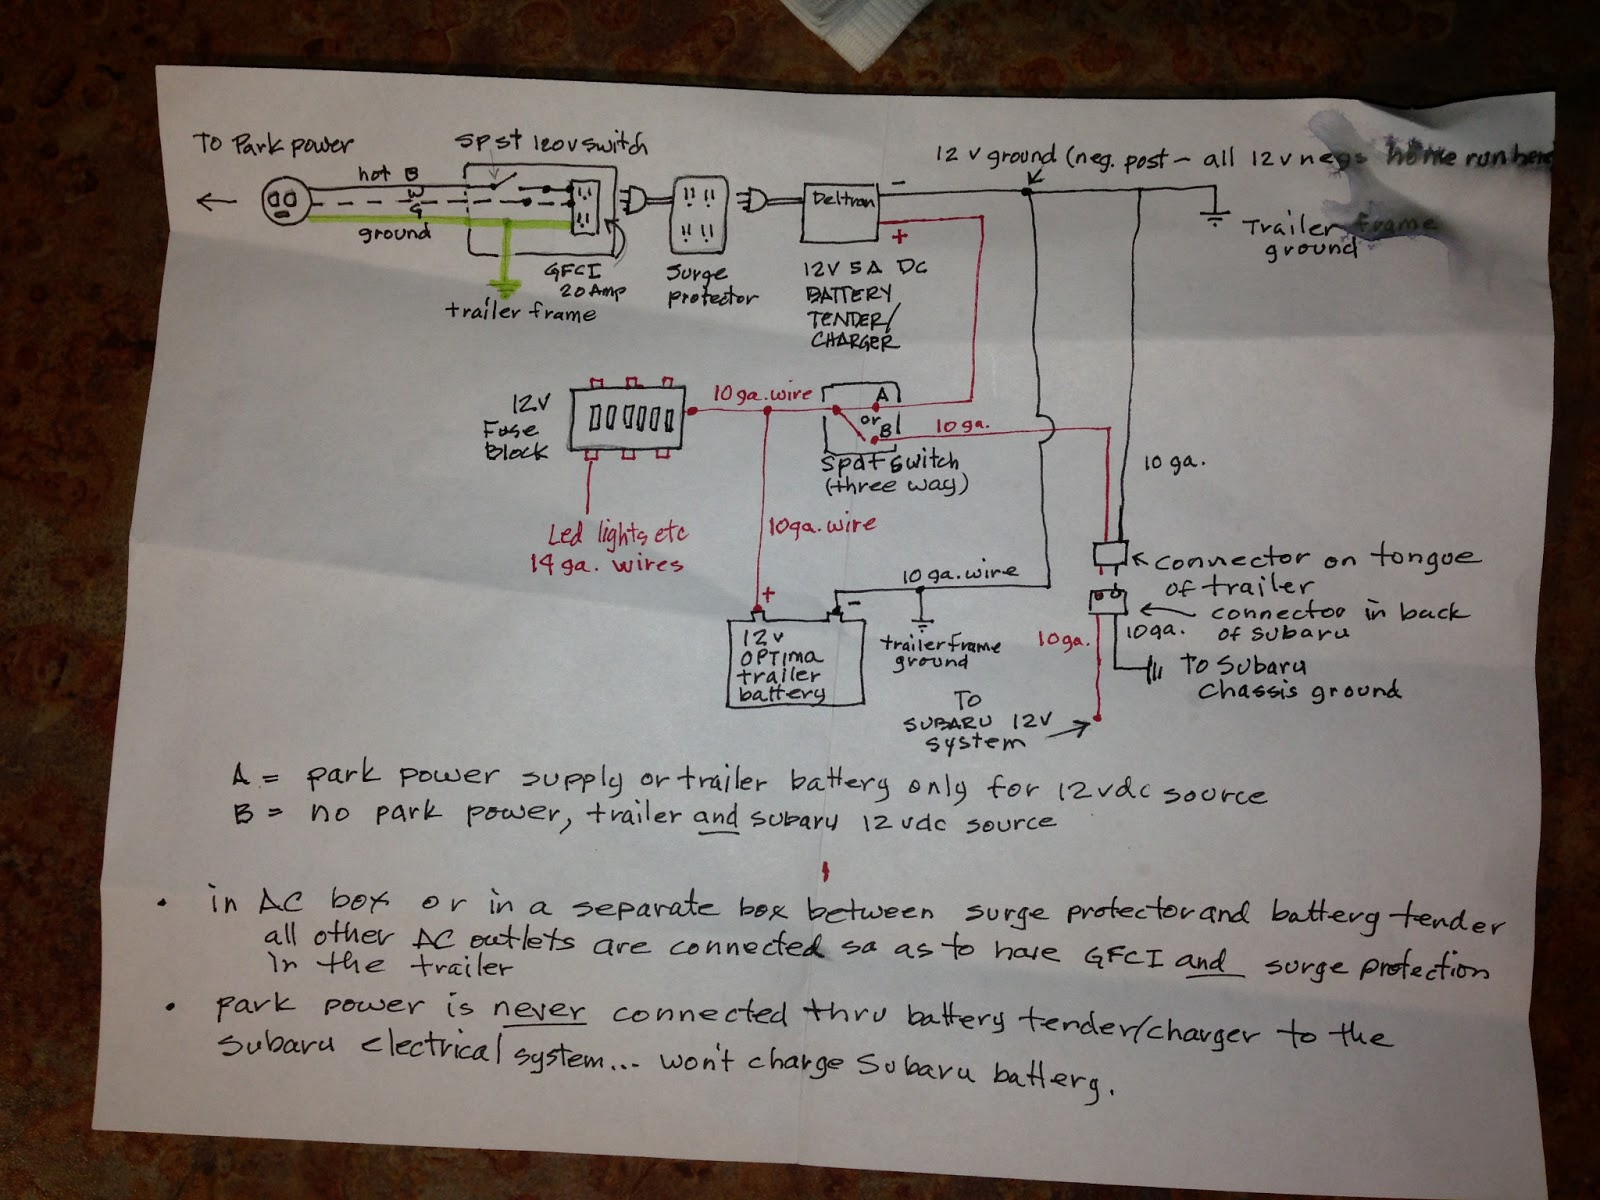 medium resolution of teardrop electrical wiring diagram wiring library teardrop electrical wiring diagram